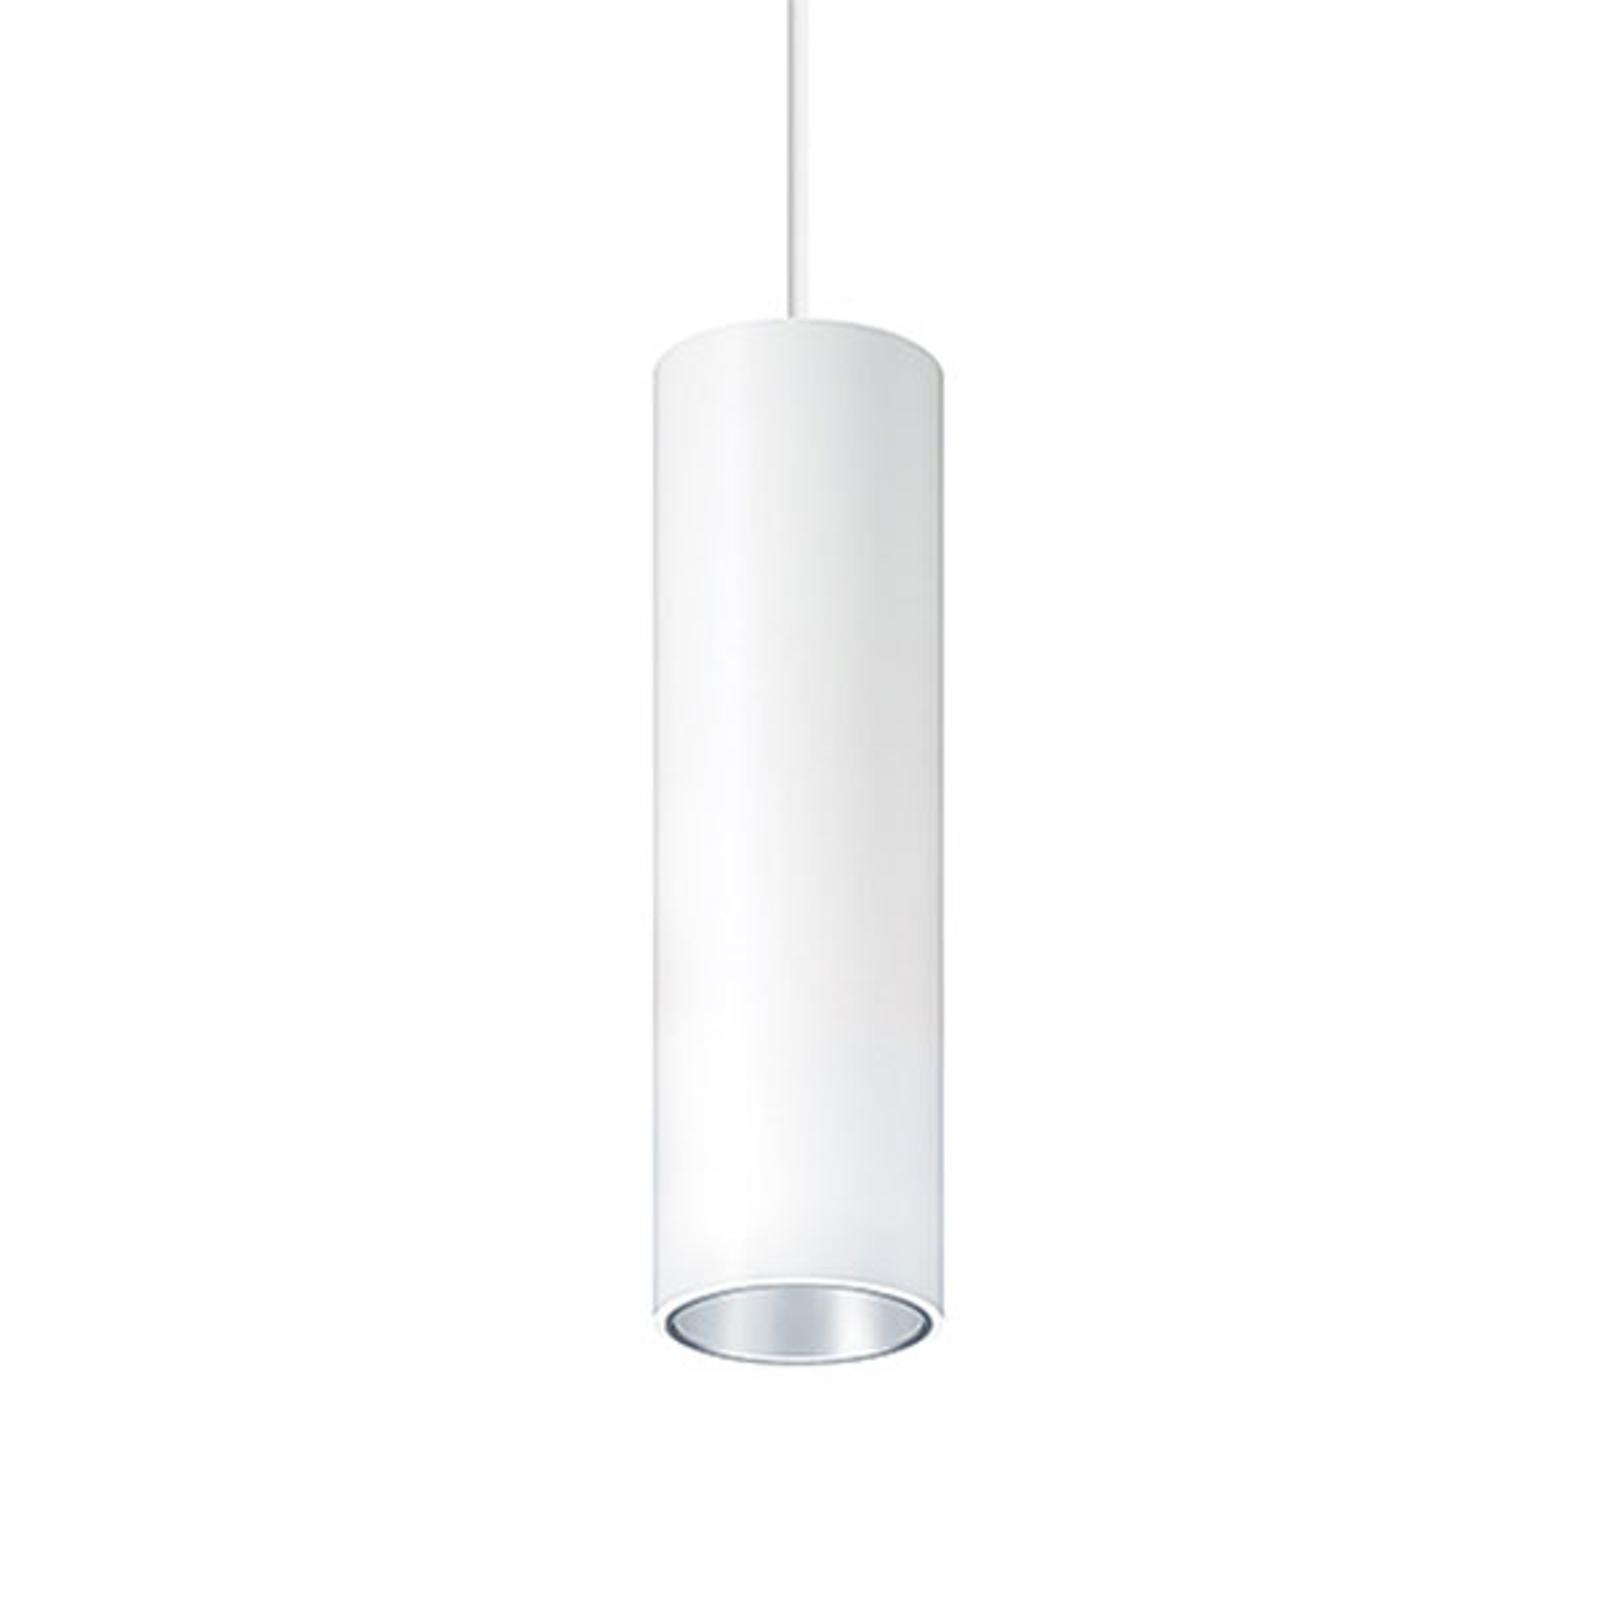 Zumtobel Panos infinity LED-Pendel, Reflektor alu